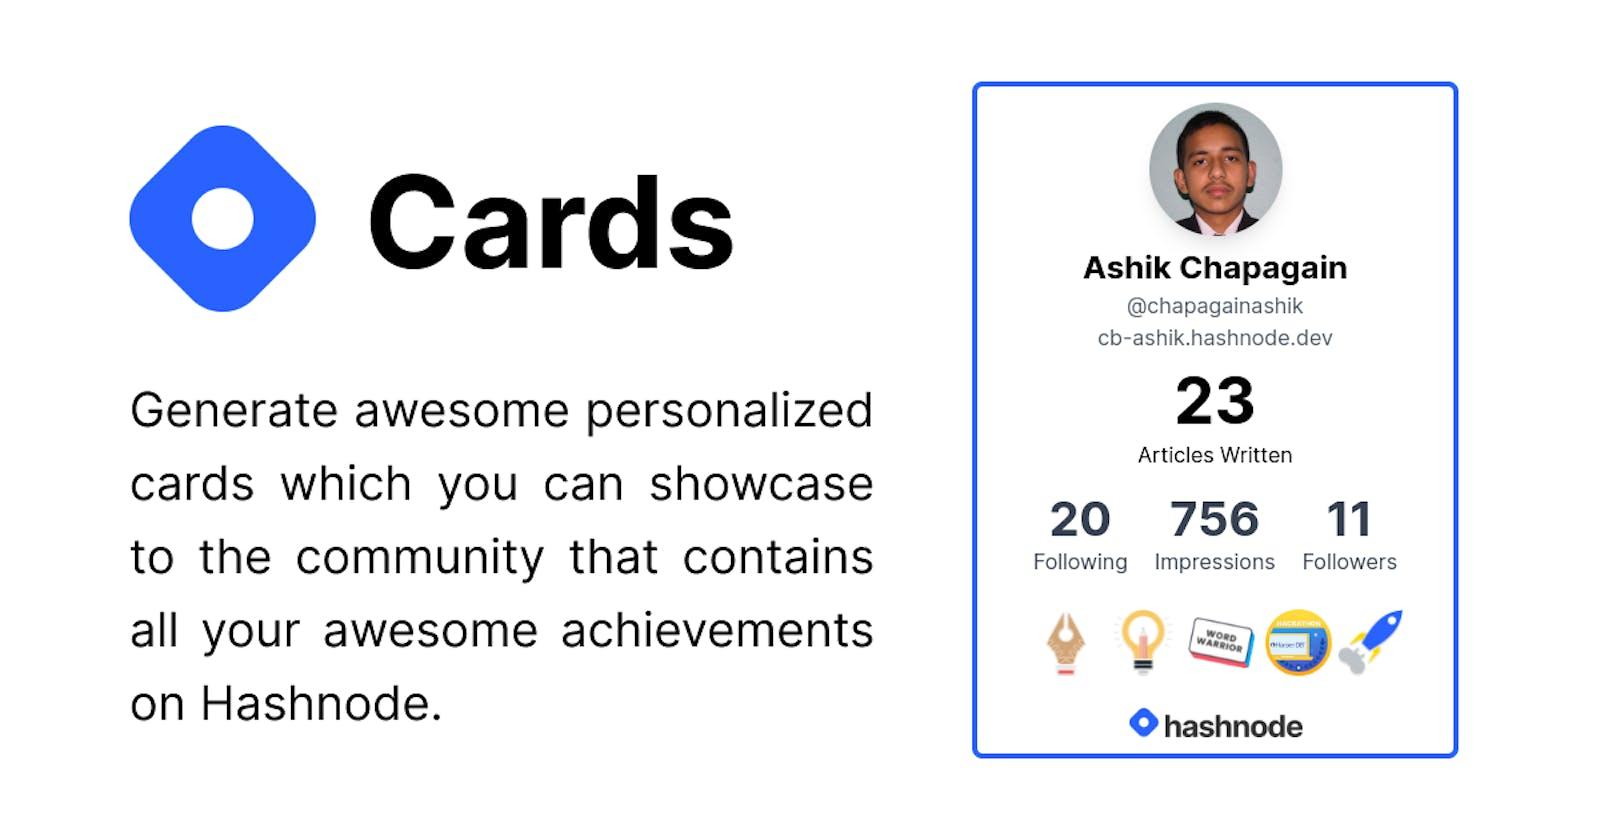 Introducing Hashnode Card: Showcase awesome hashnode achievements